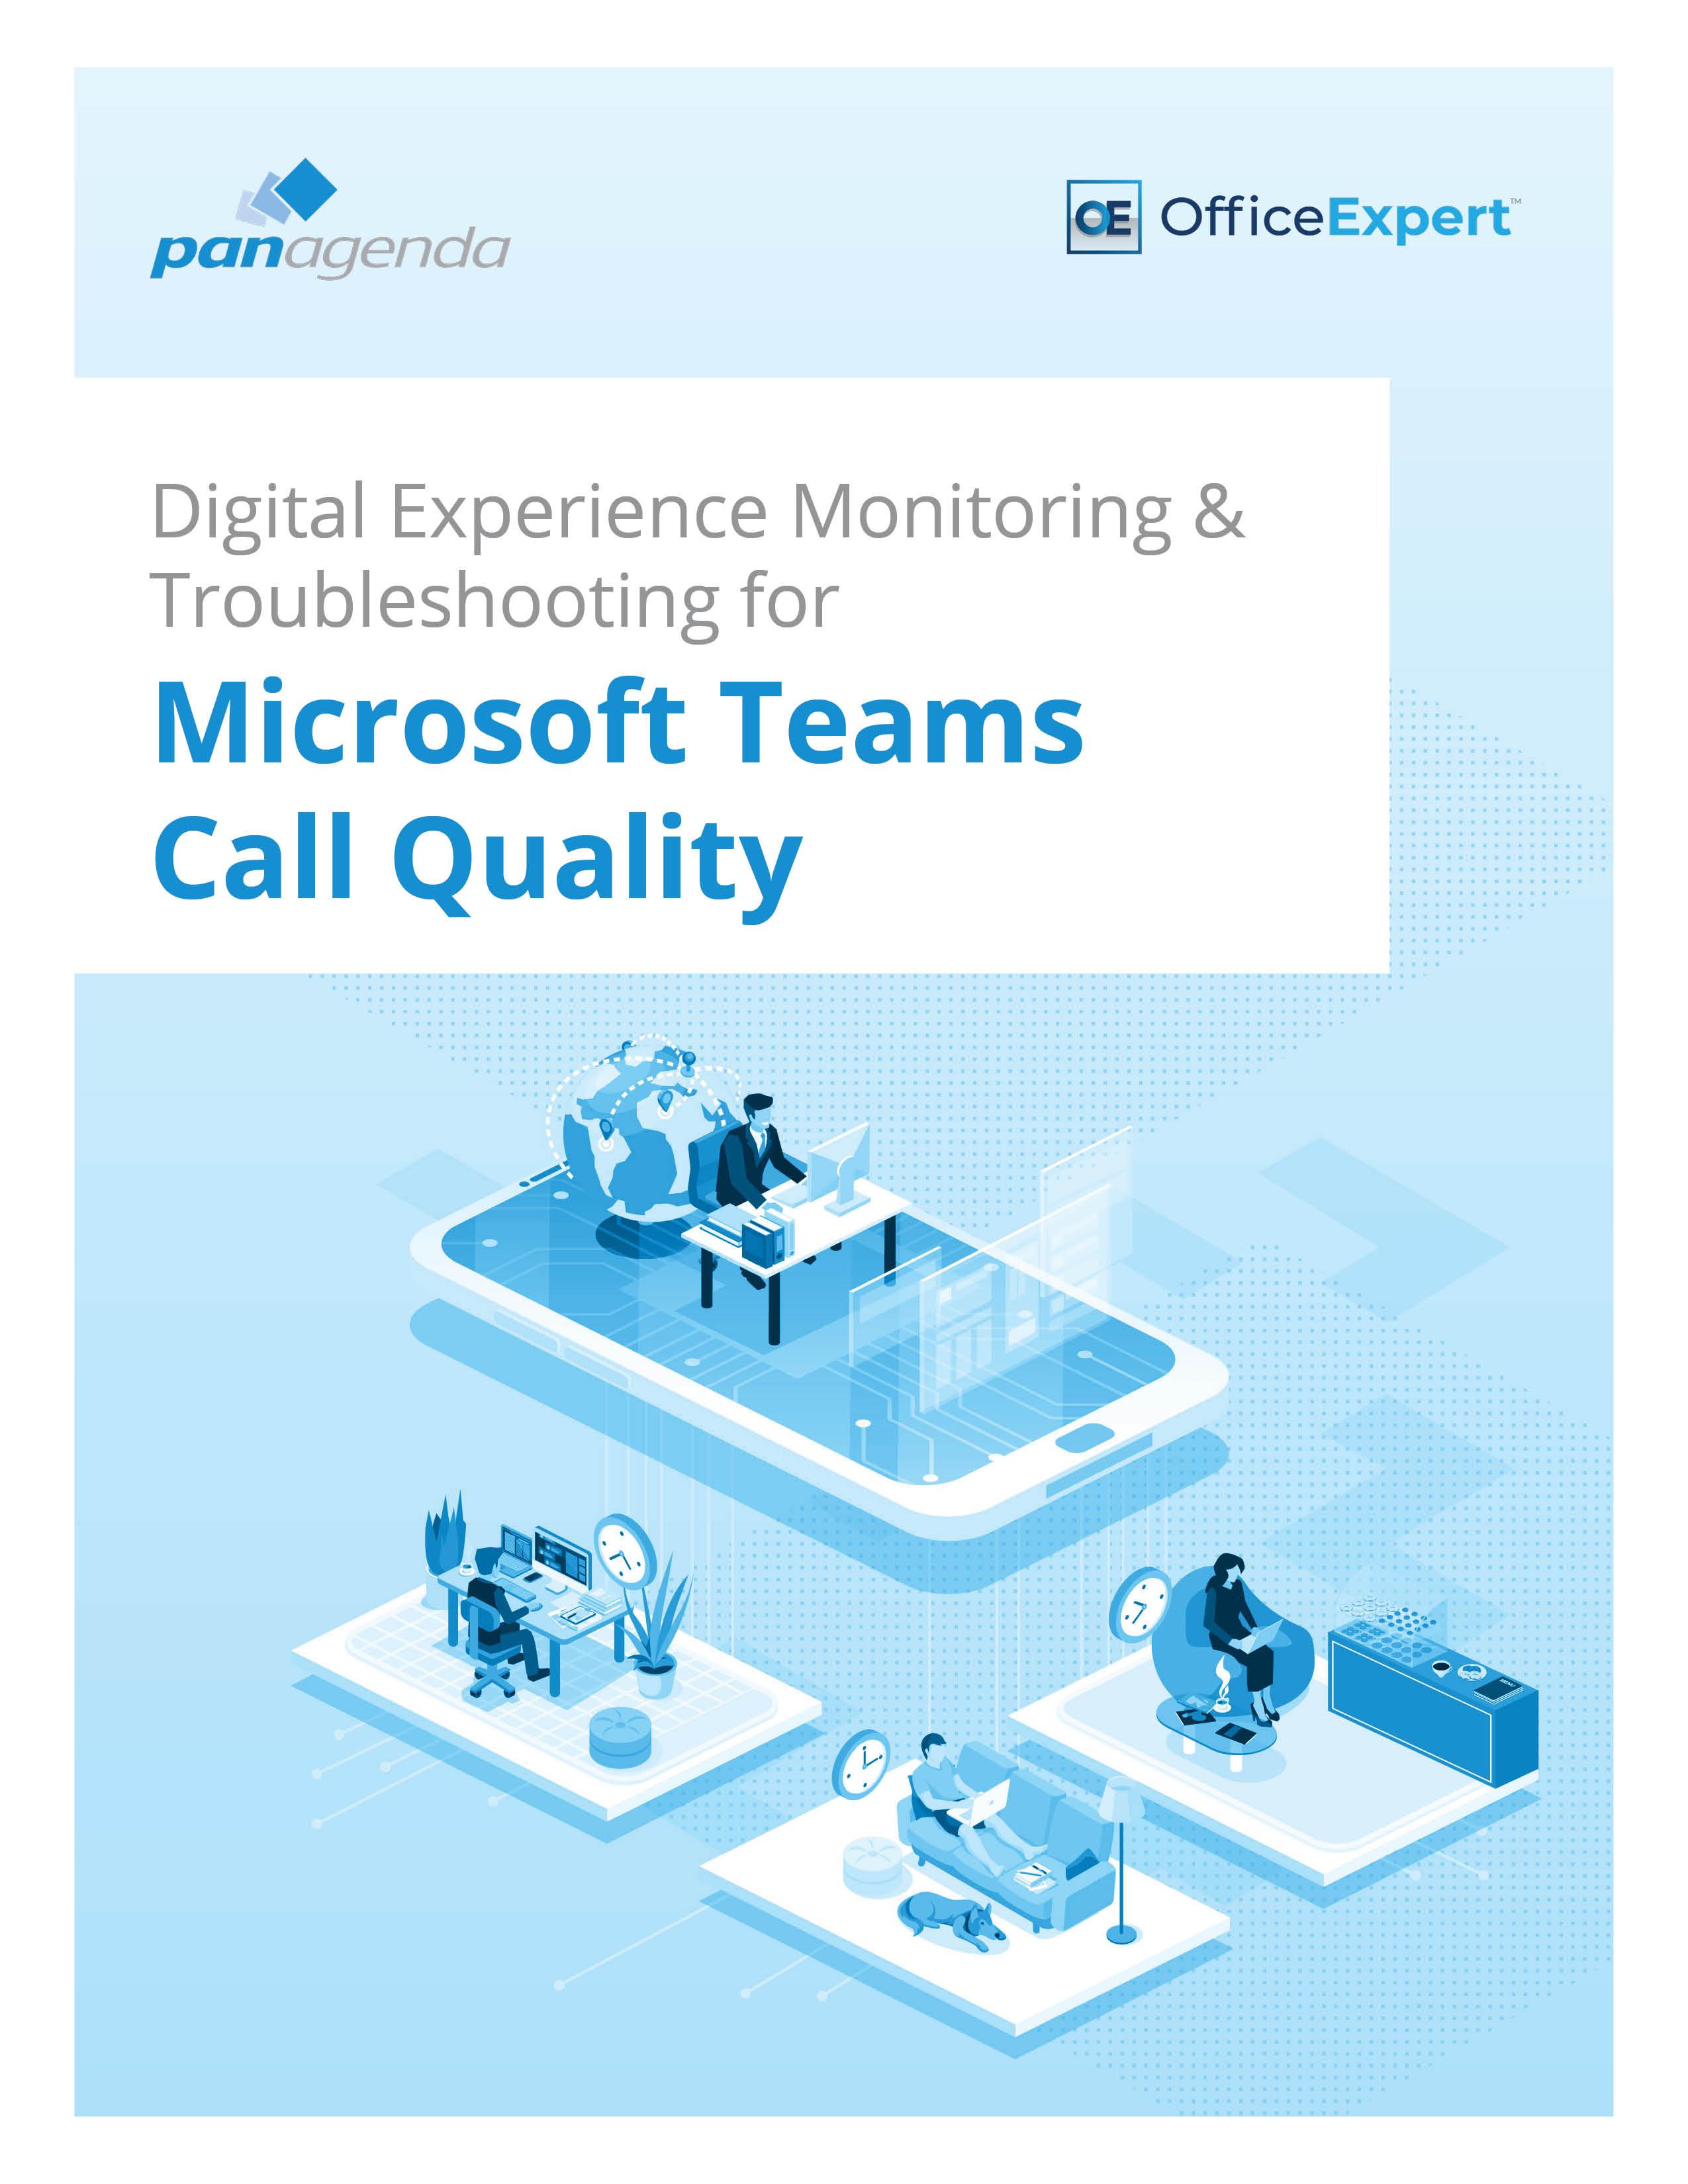 OfficeExpert Whitepaper - Microsoft Teams Call Quality Troubleshooting